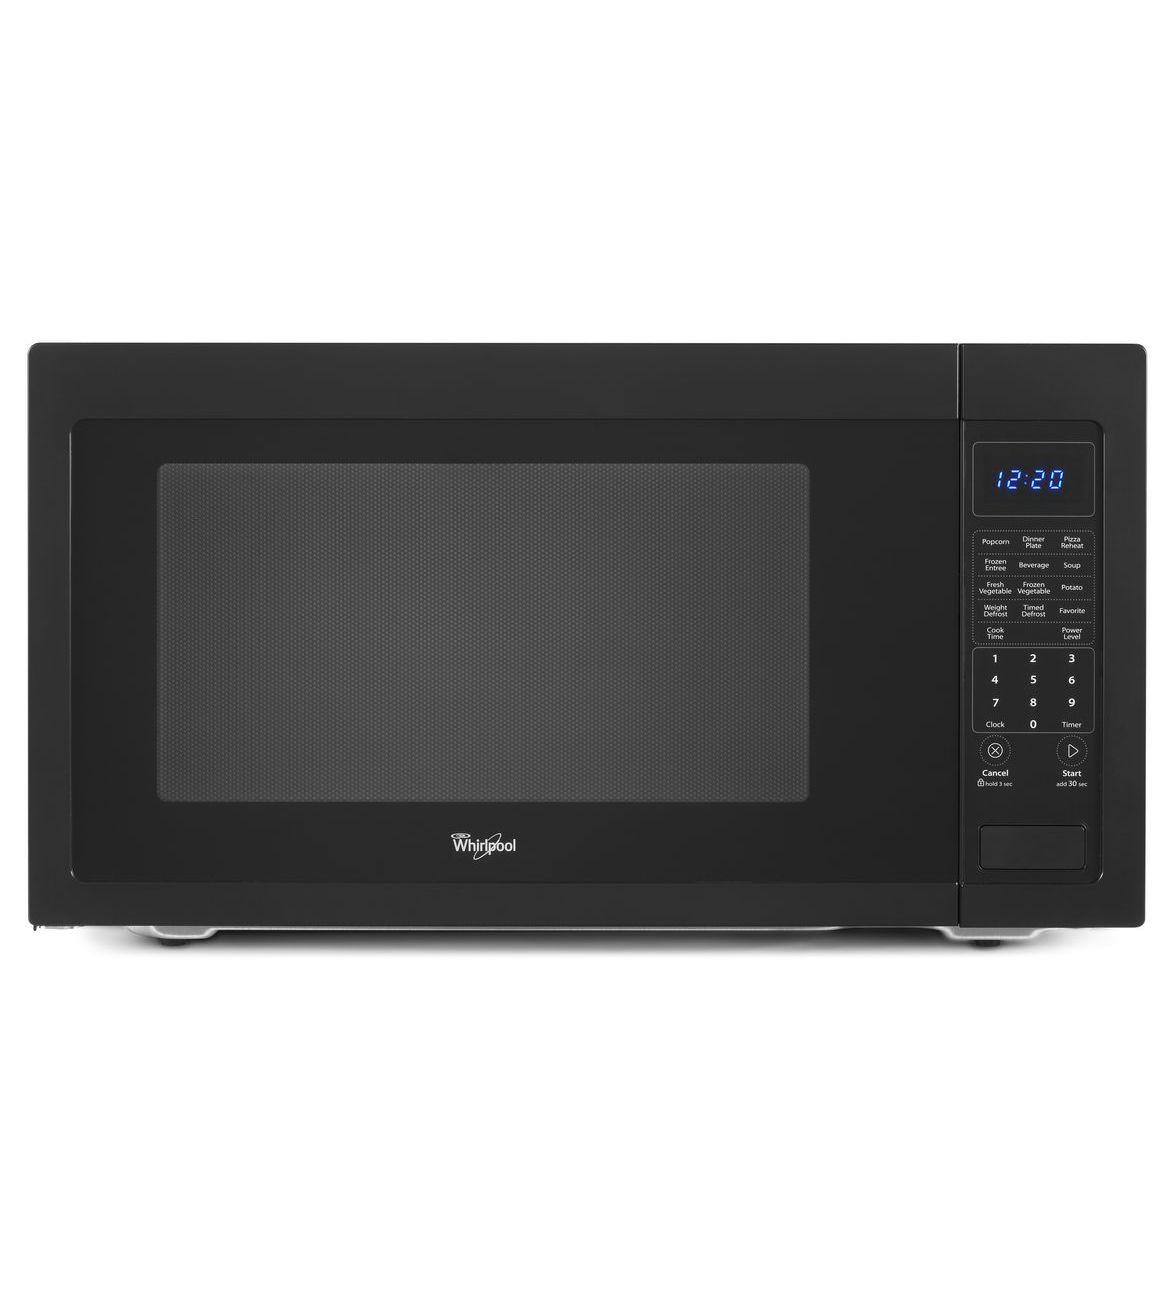 WMC50522AB Whirlpool wmc50522ab Countertop Microwaves Black